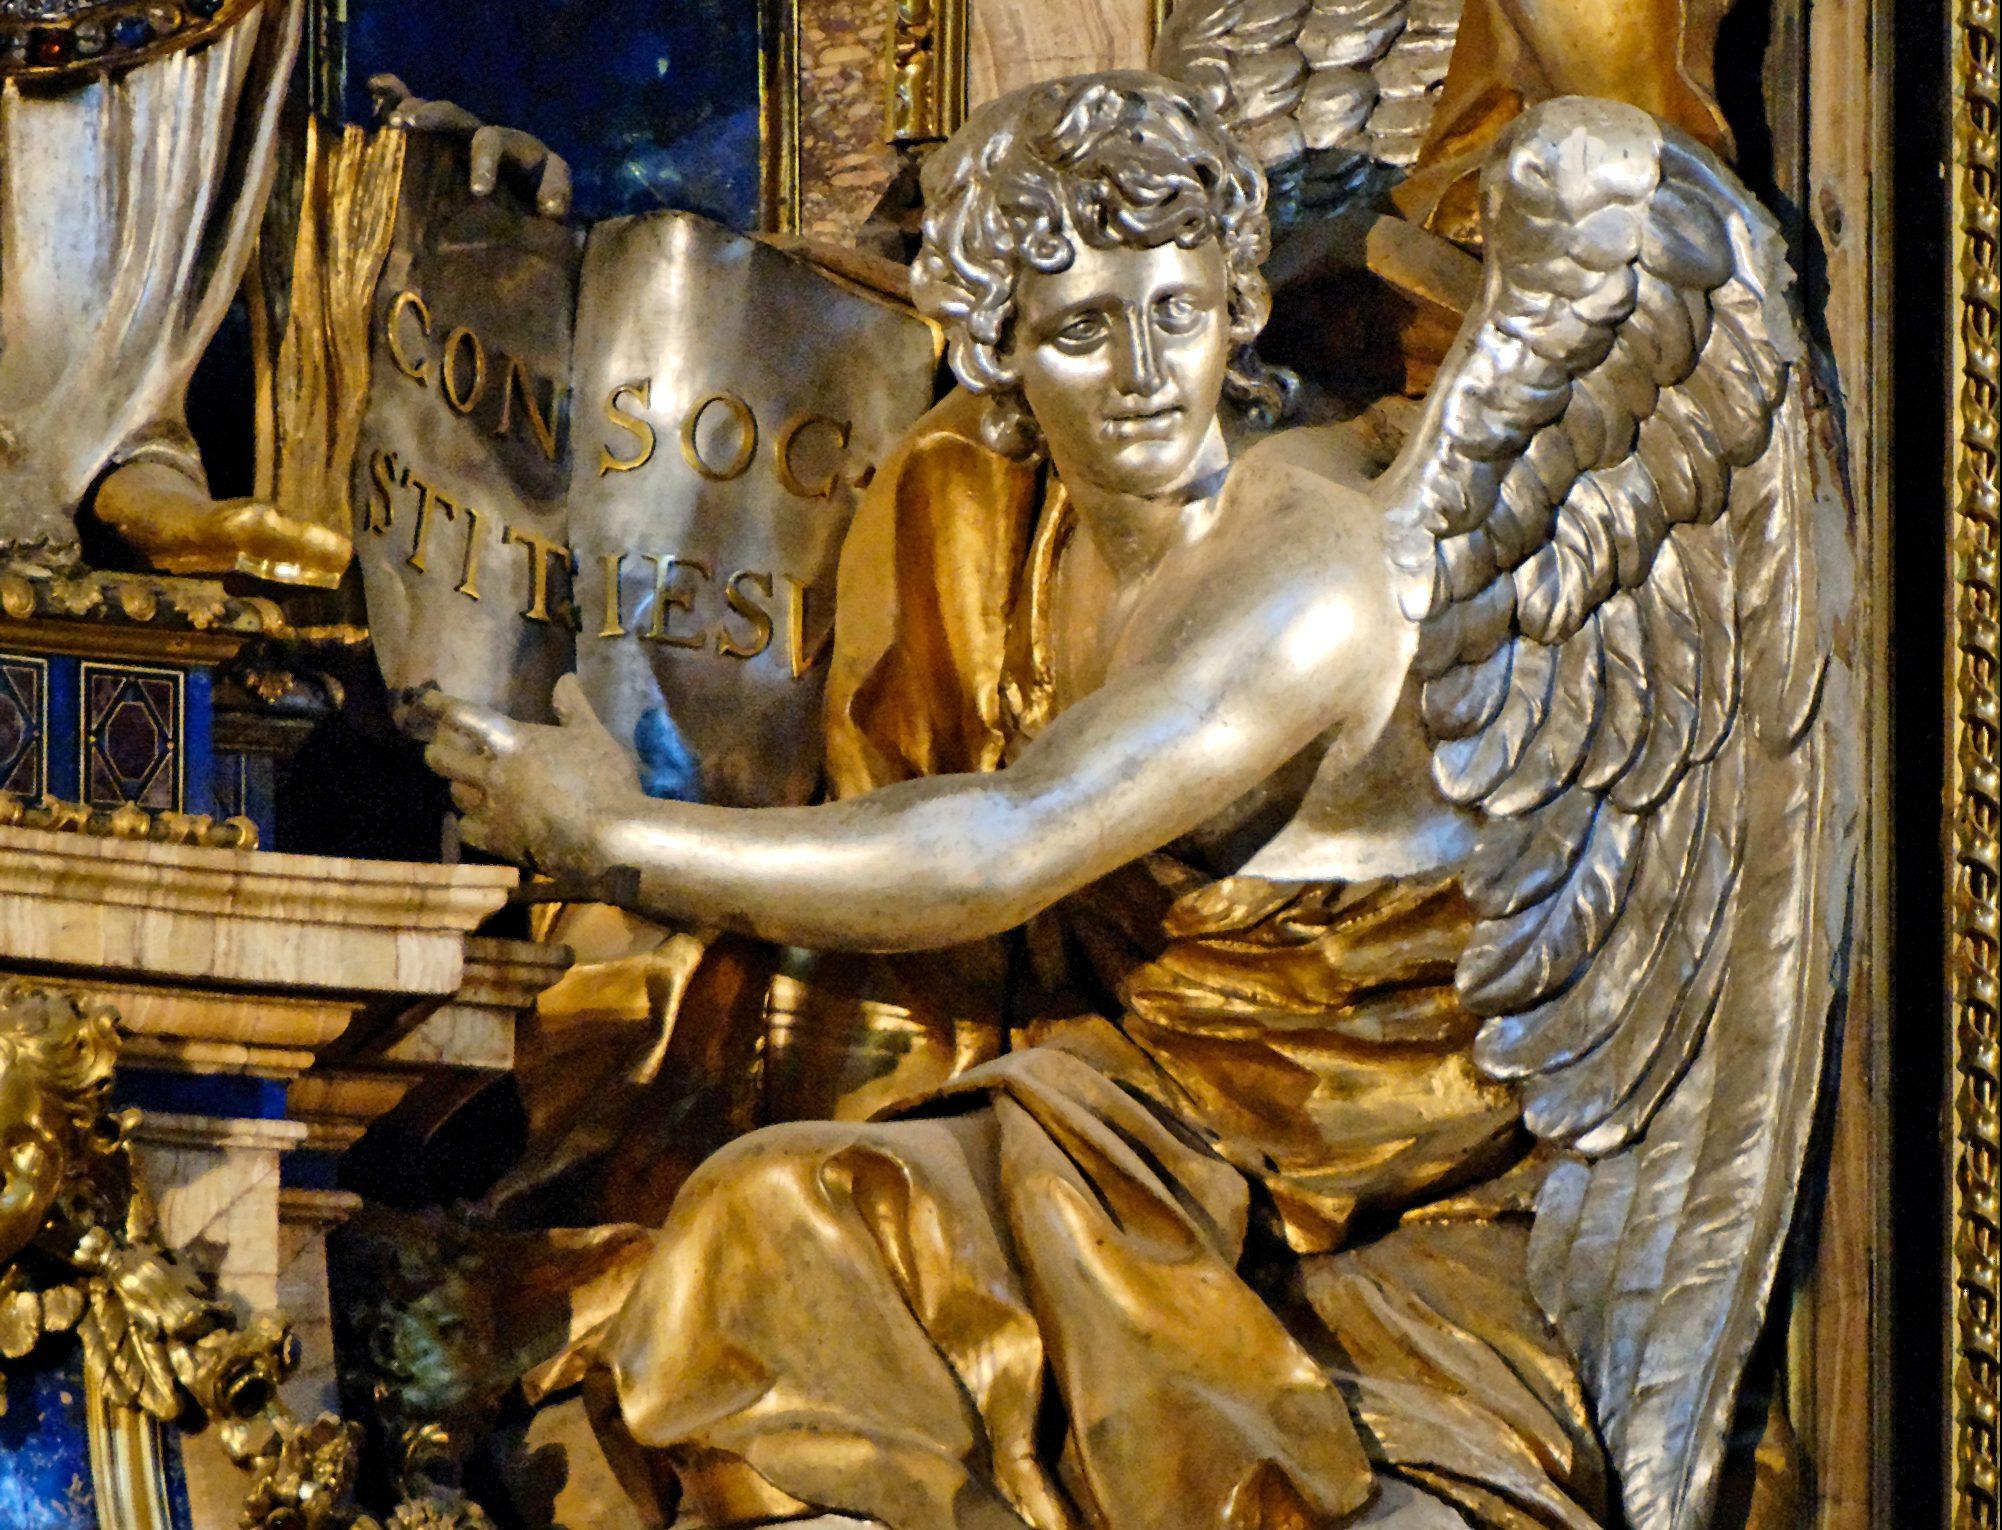 GESU CHURCH ANGEL AT THE FEET OF ST IGNATIUS